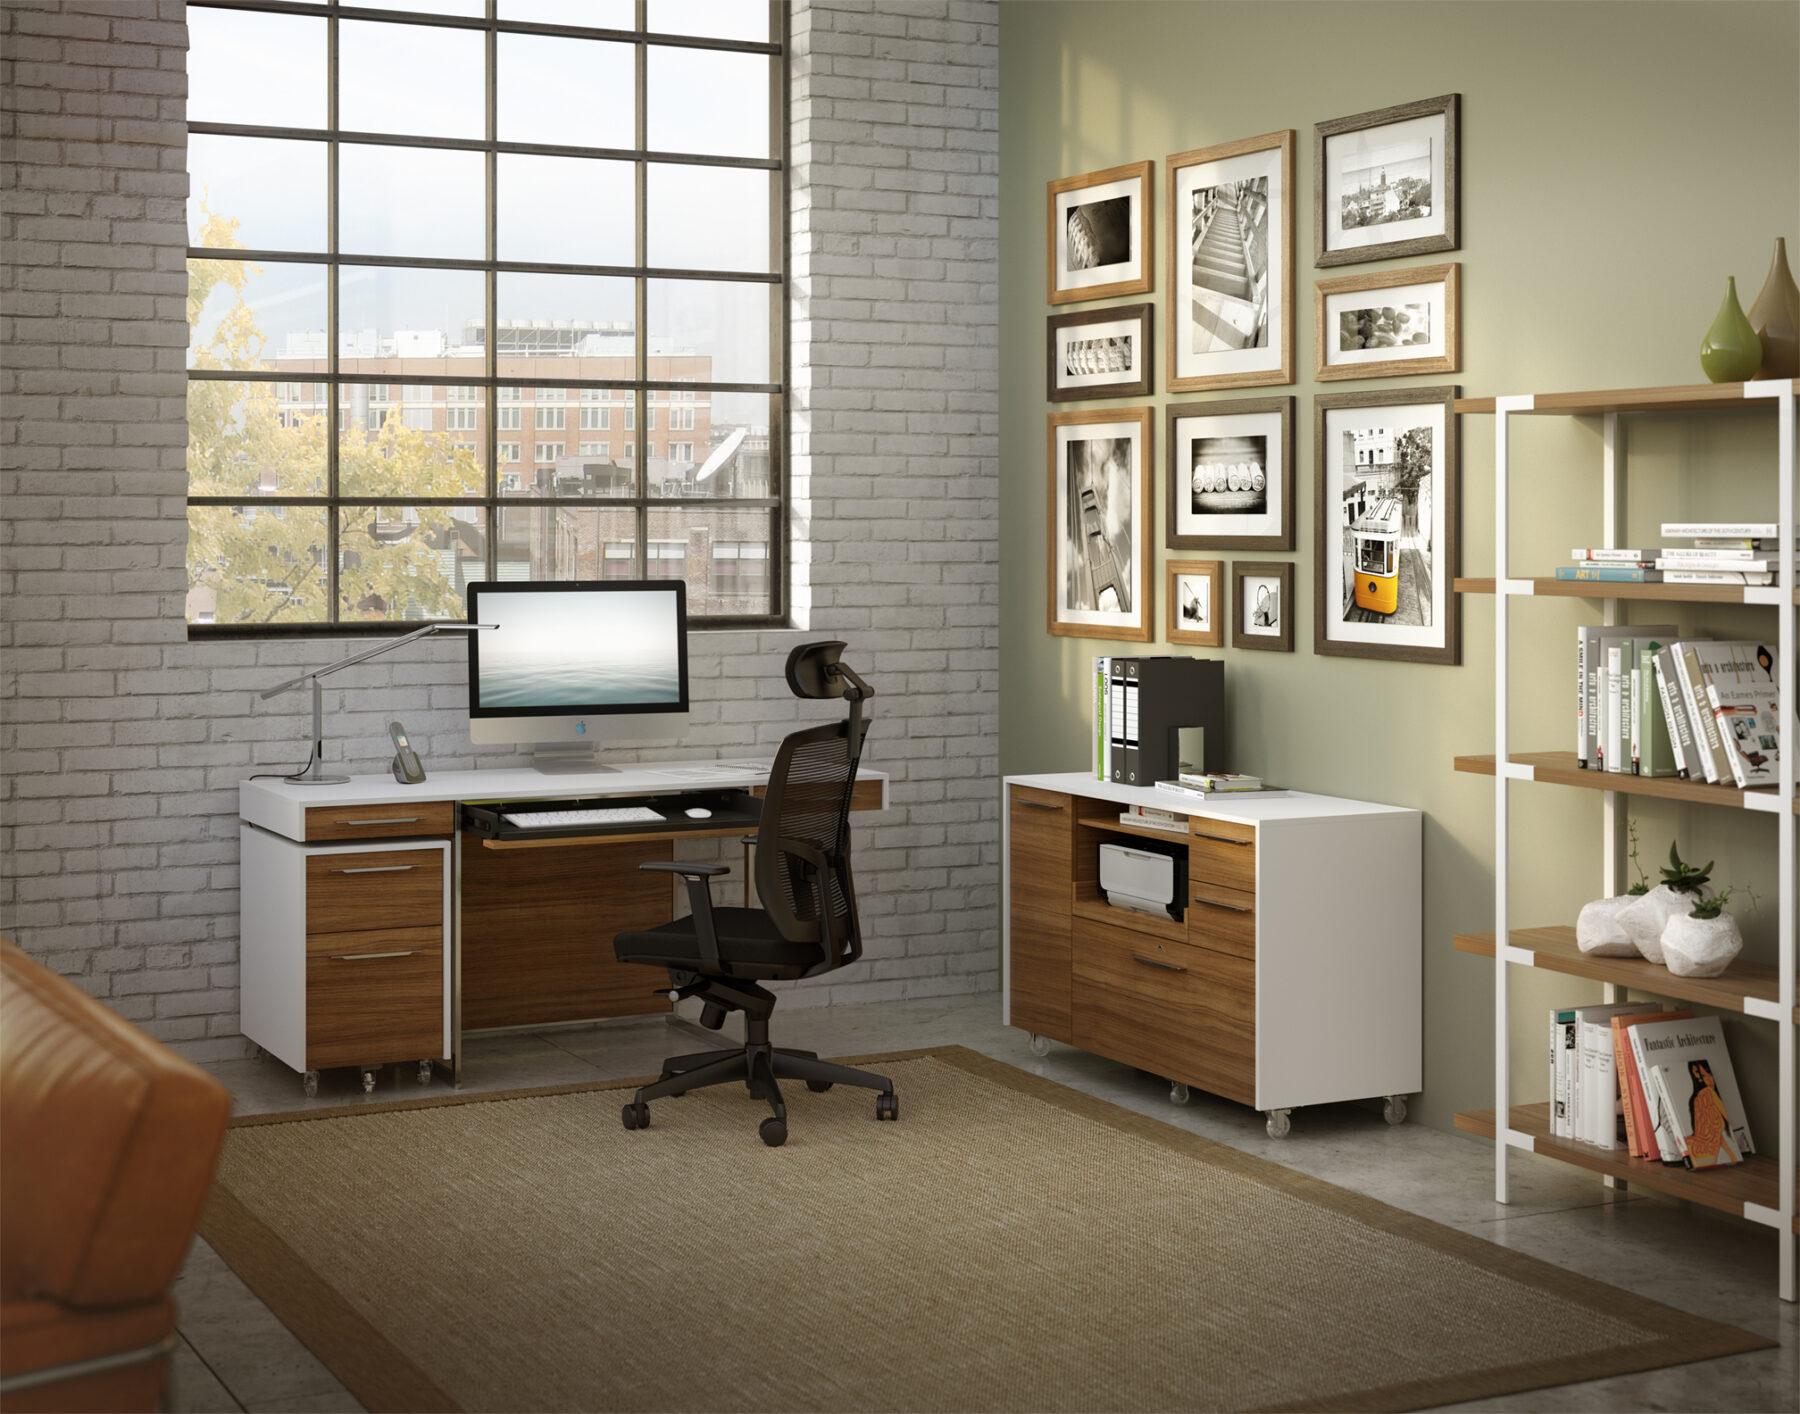 format-office-bdi-TC-223-task-chair